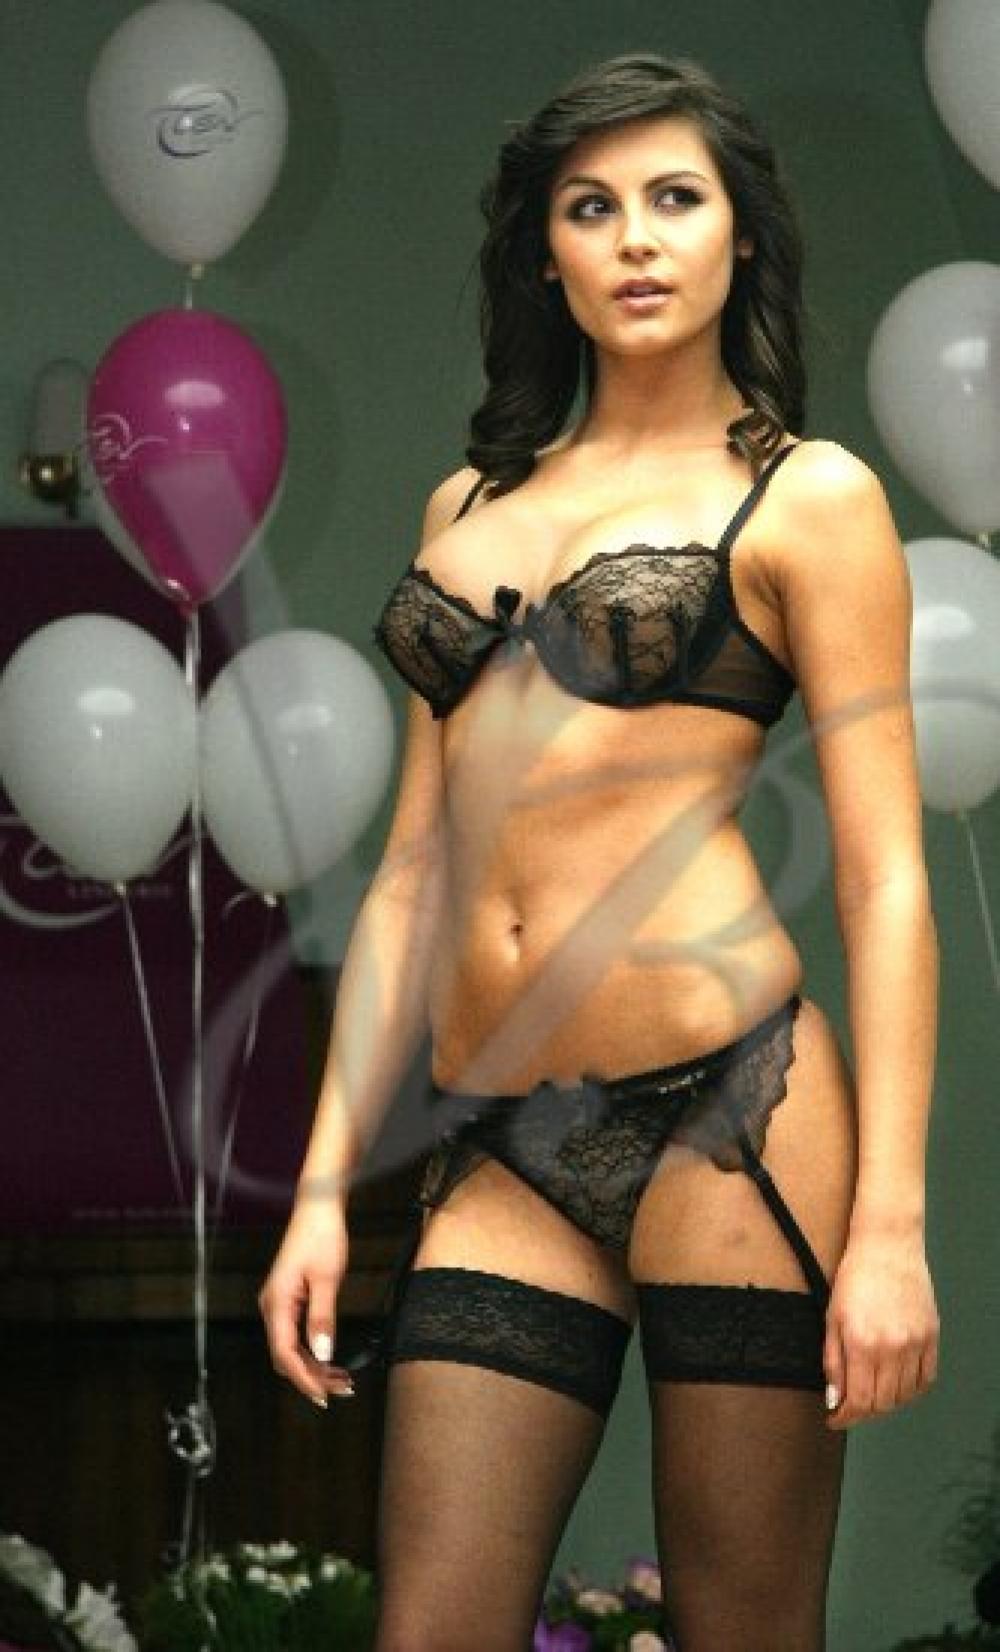 a brazilian top model, impressedbulgarian beauties | bv studio